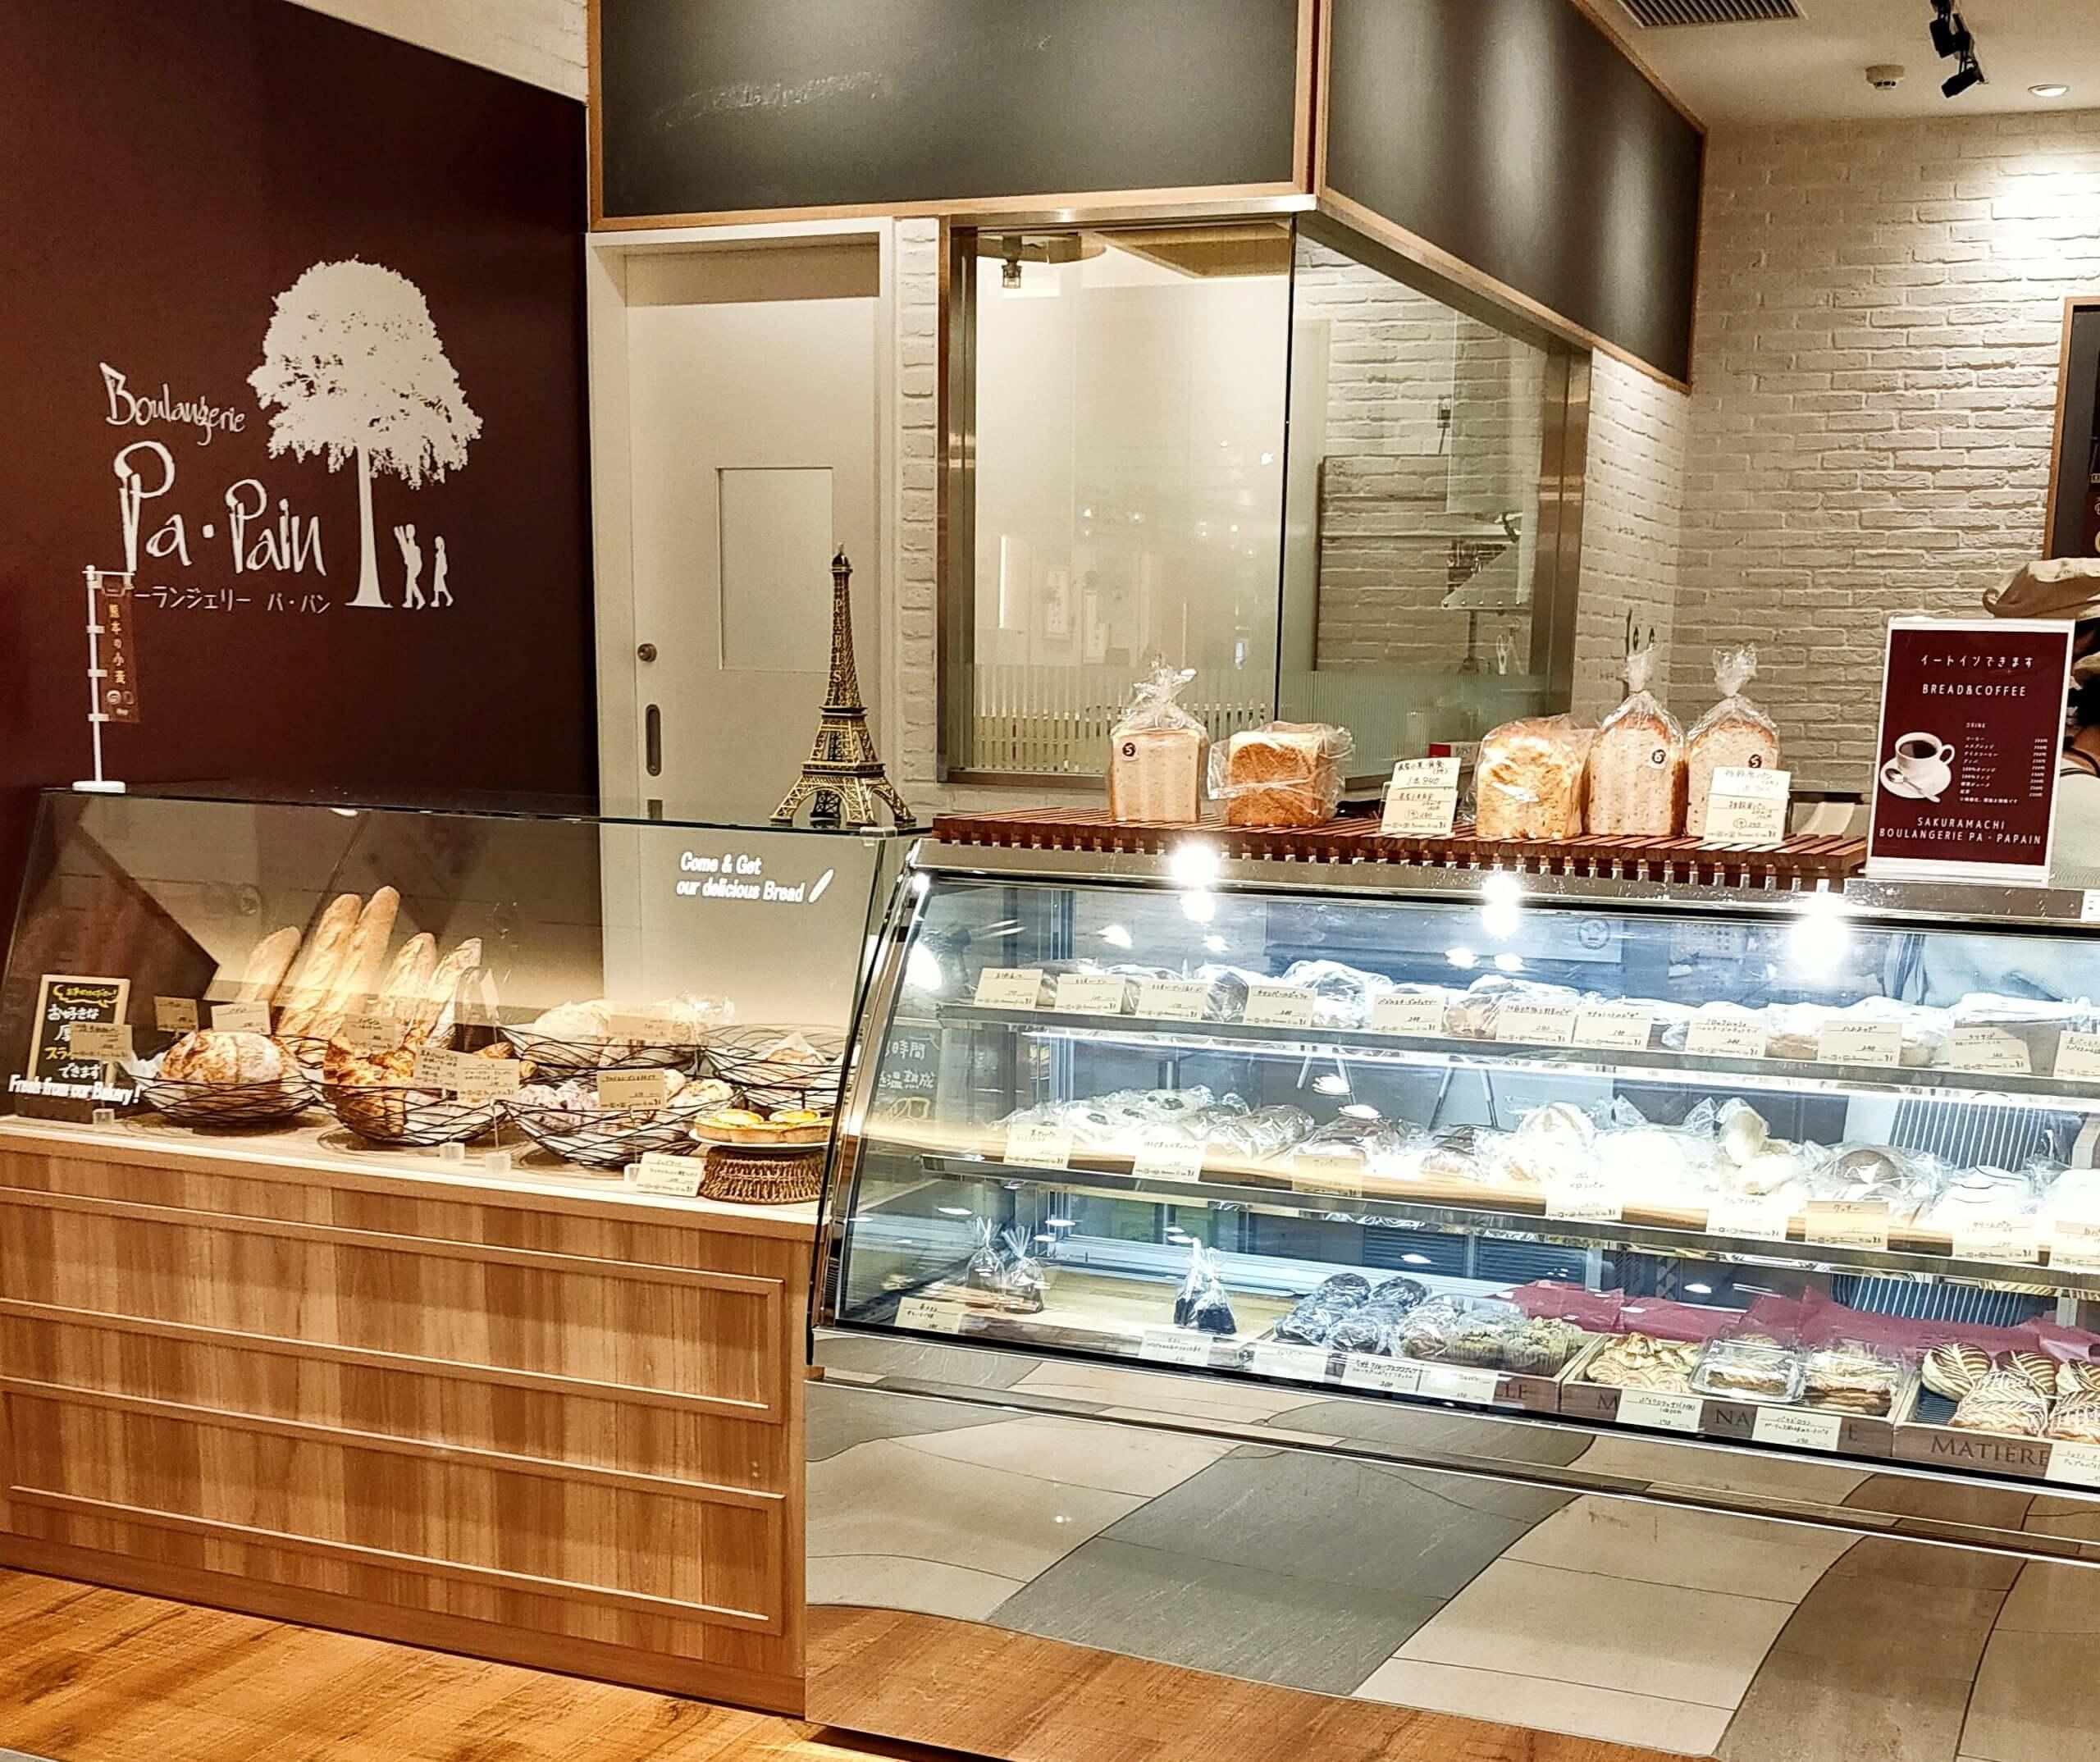 【Boulangerie Pa・Pain(ブーランジェリー パ・パン)】サクラマチ B1 ★人気の無添加手作りパン屋さん《熊本市中央区桜町 》